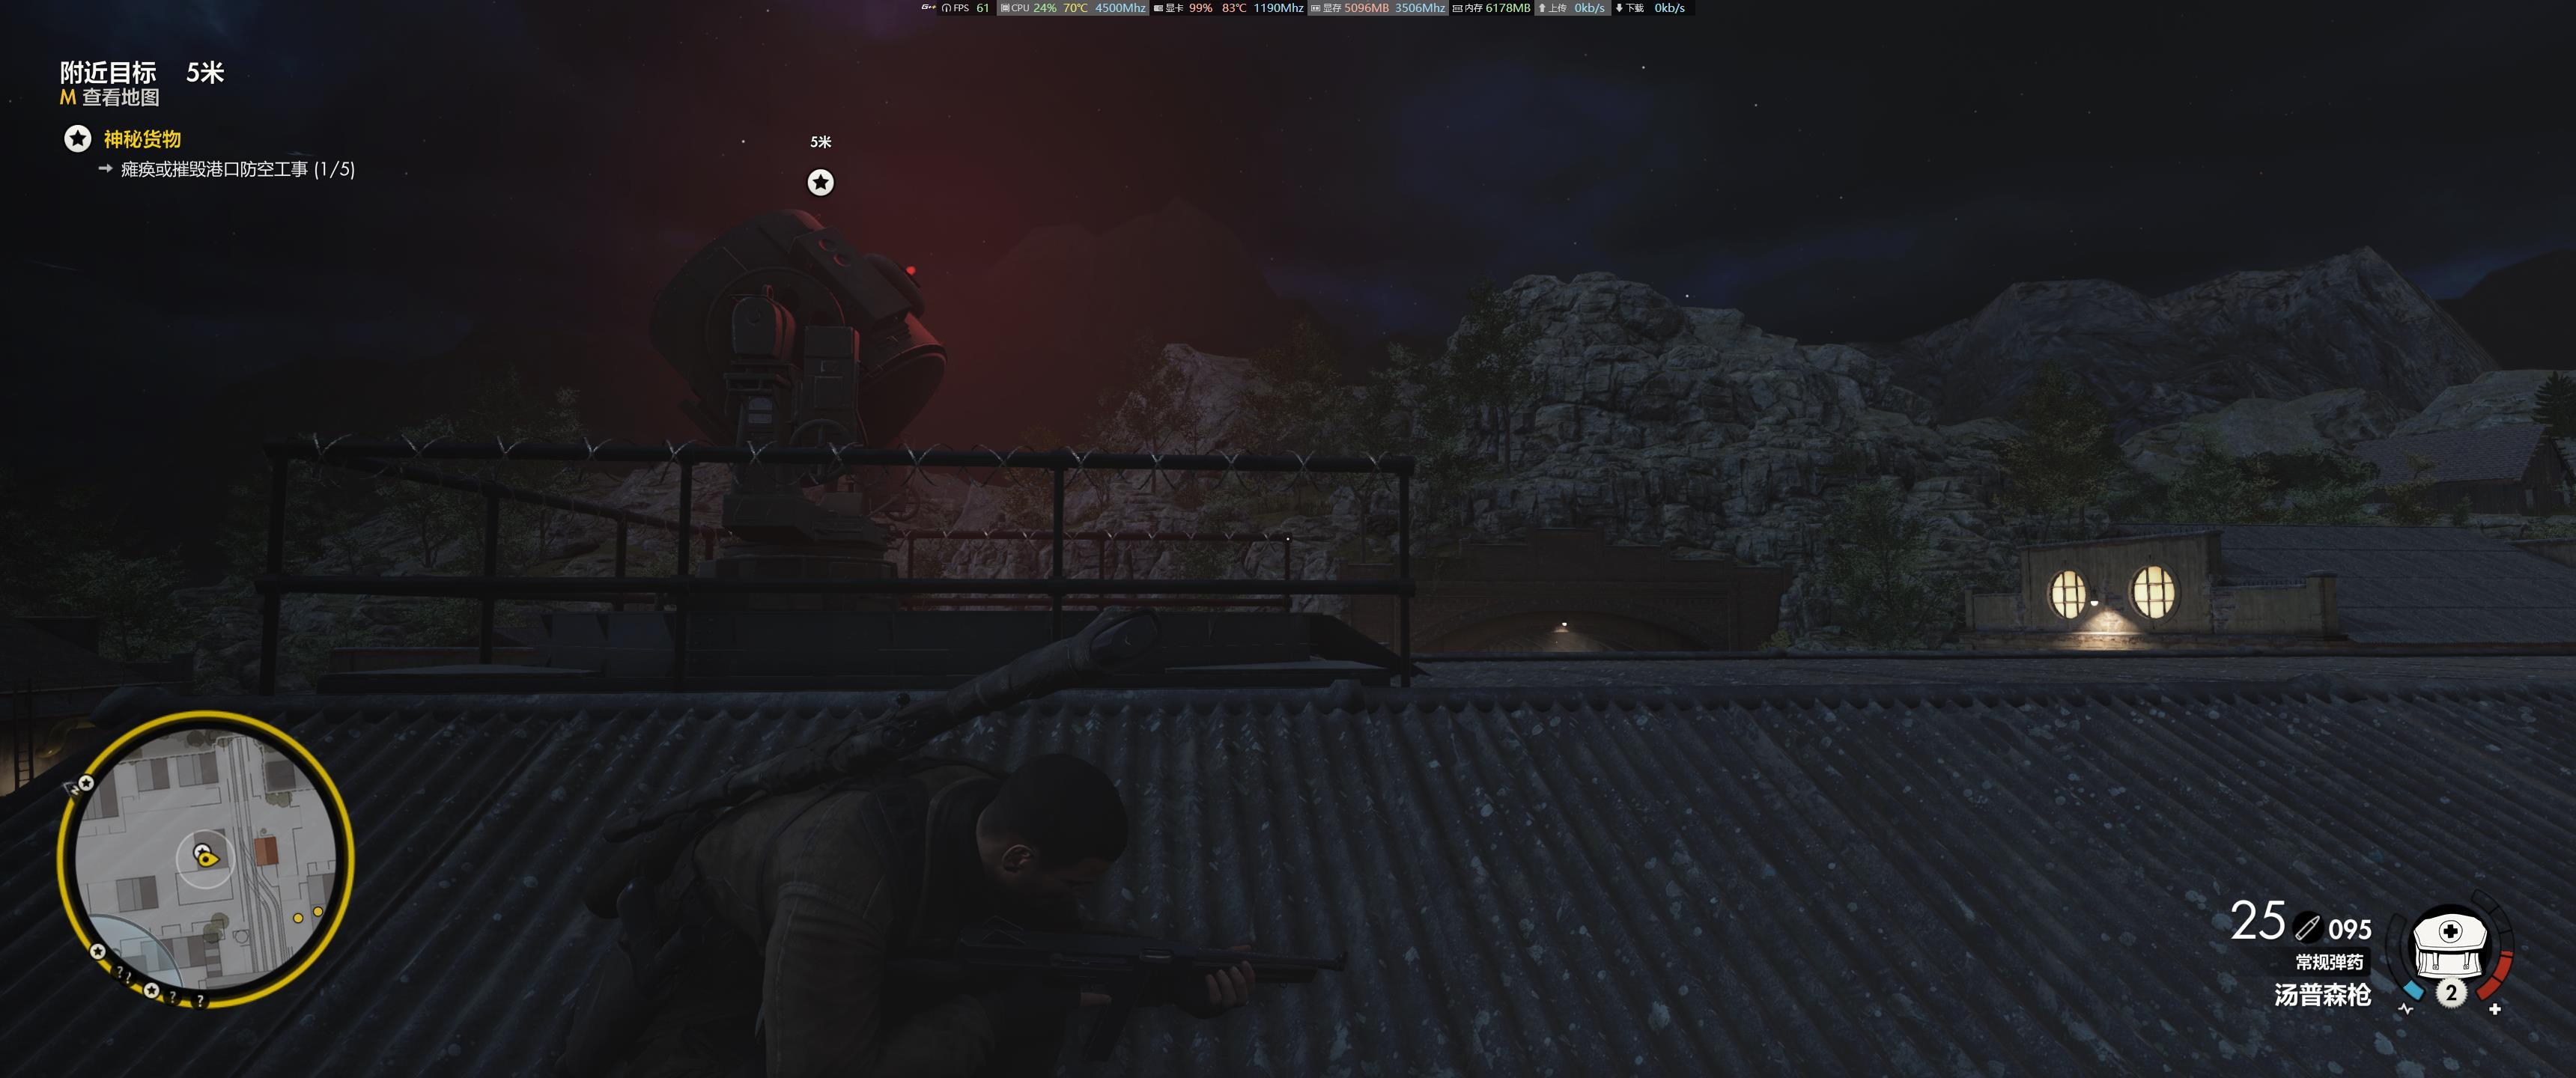 SniperElite4_DX11-01-21-12-44.jpg